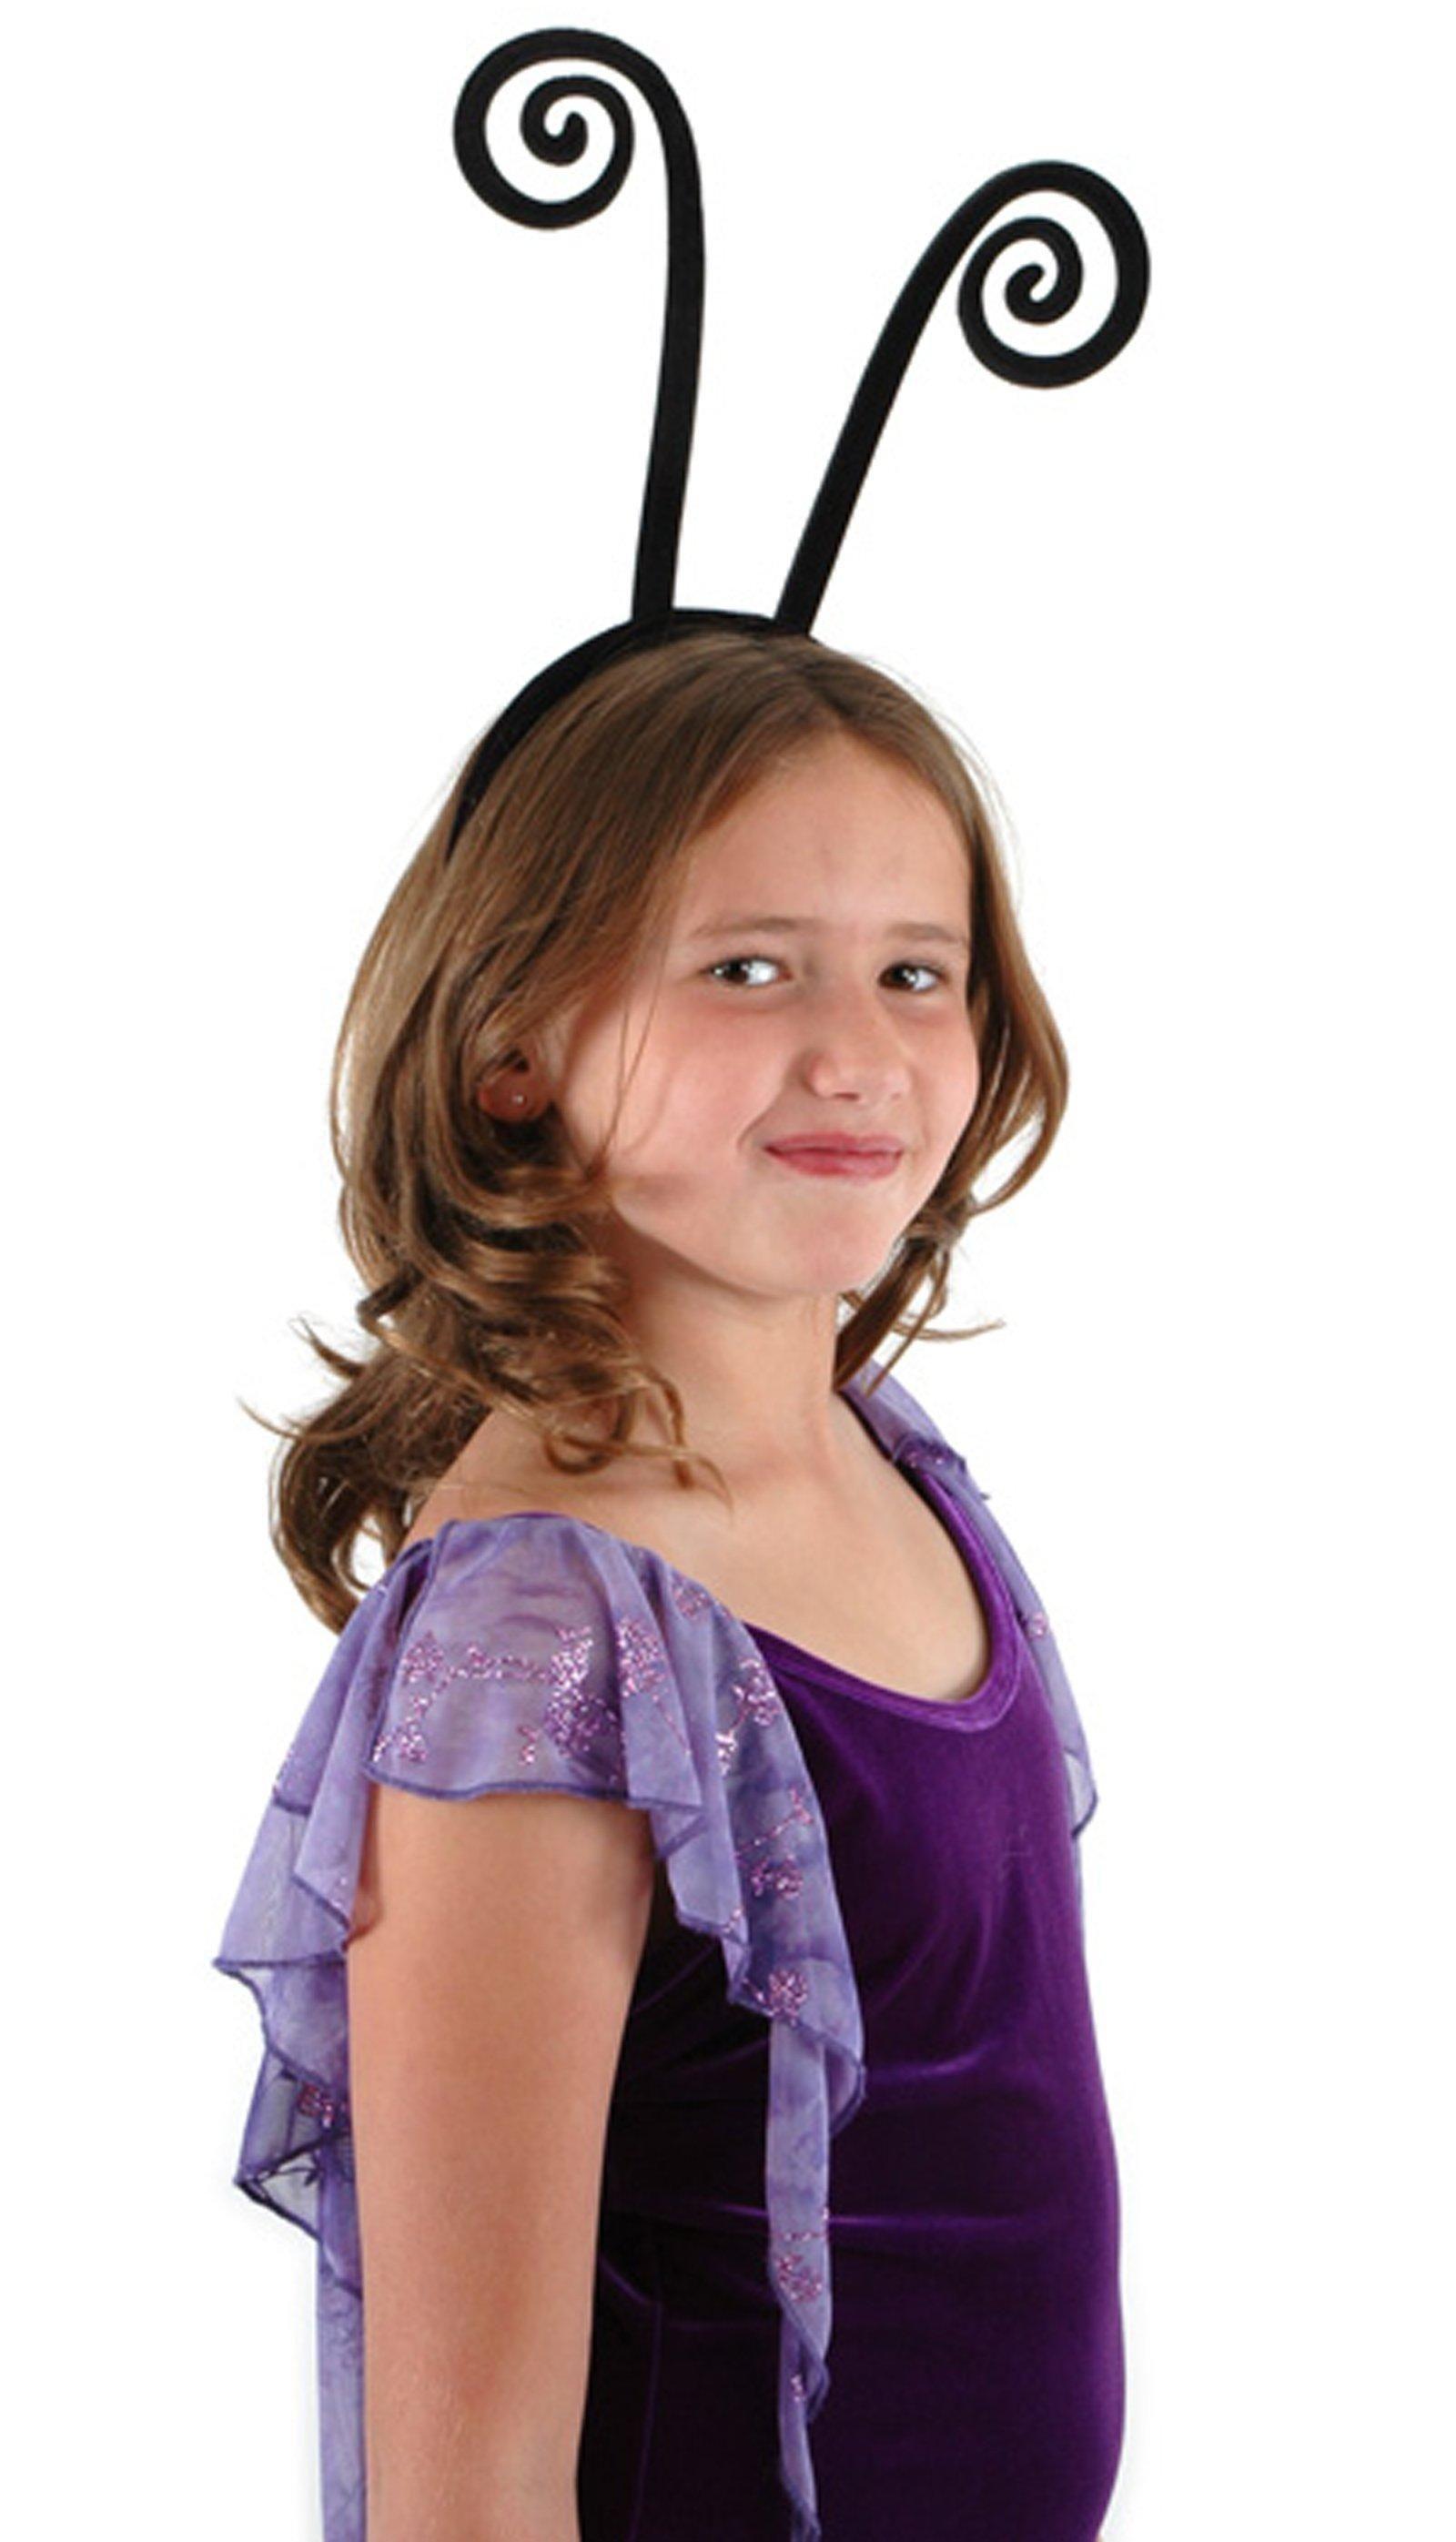 Girl Kids/' Insect Antenna Headband Bumblebee Ladybug Costume Accessories